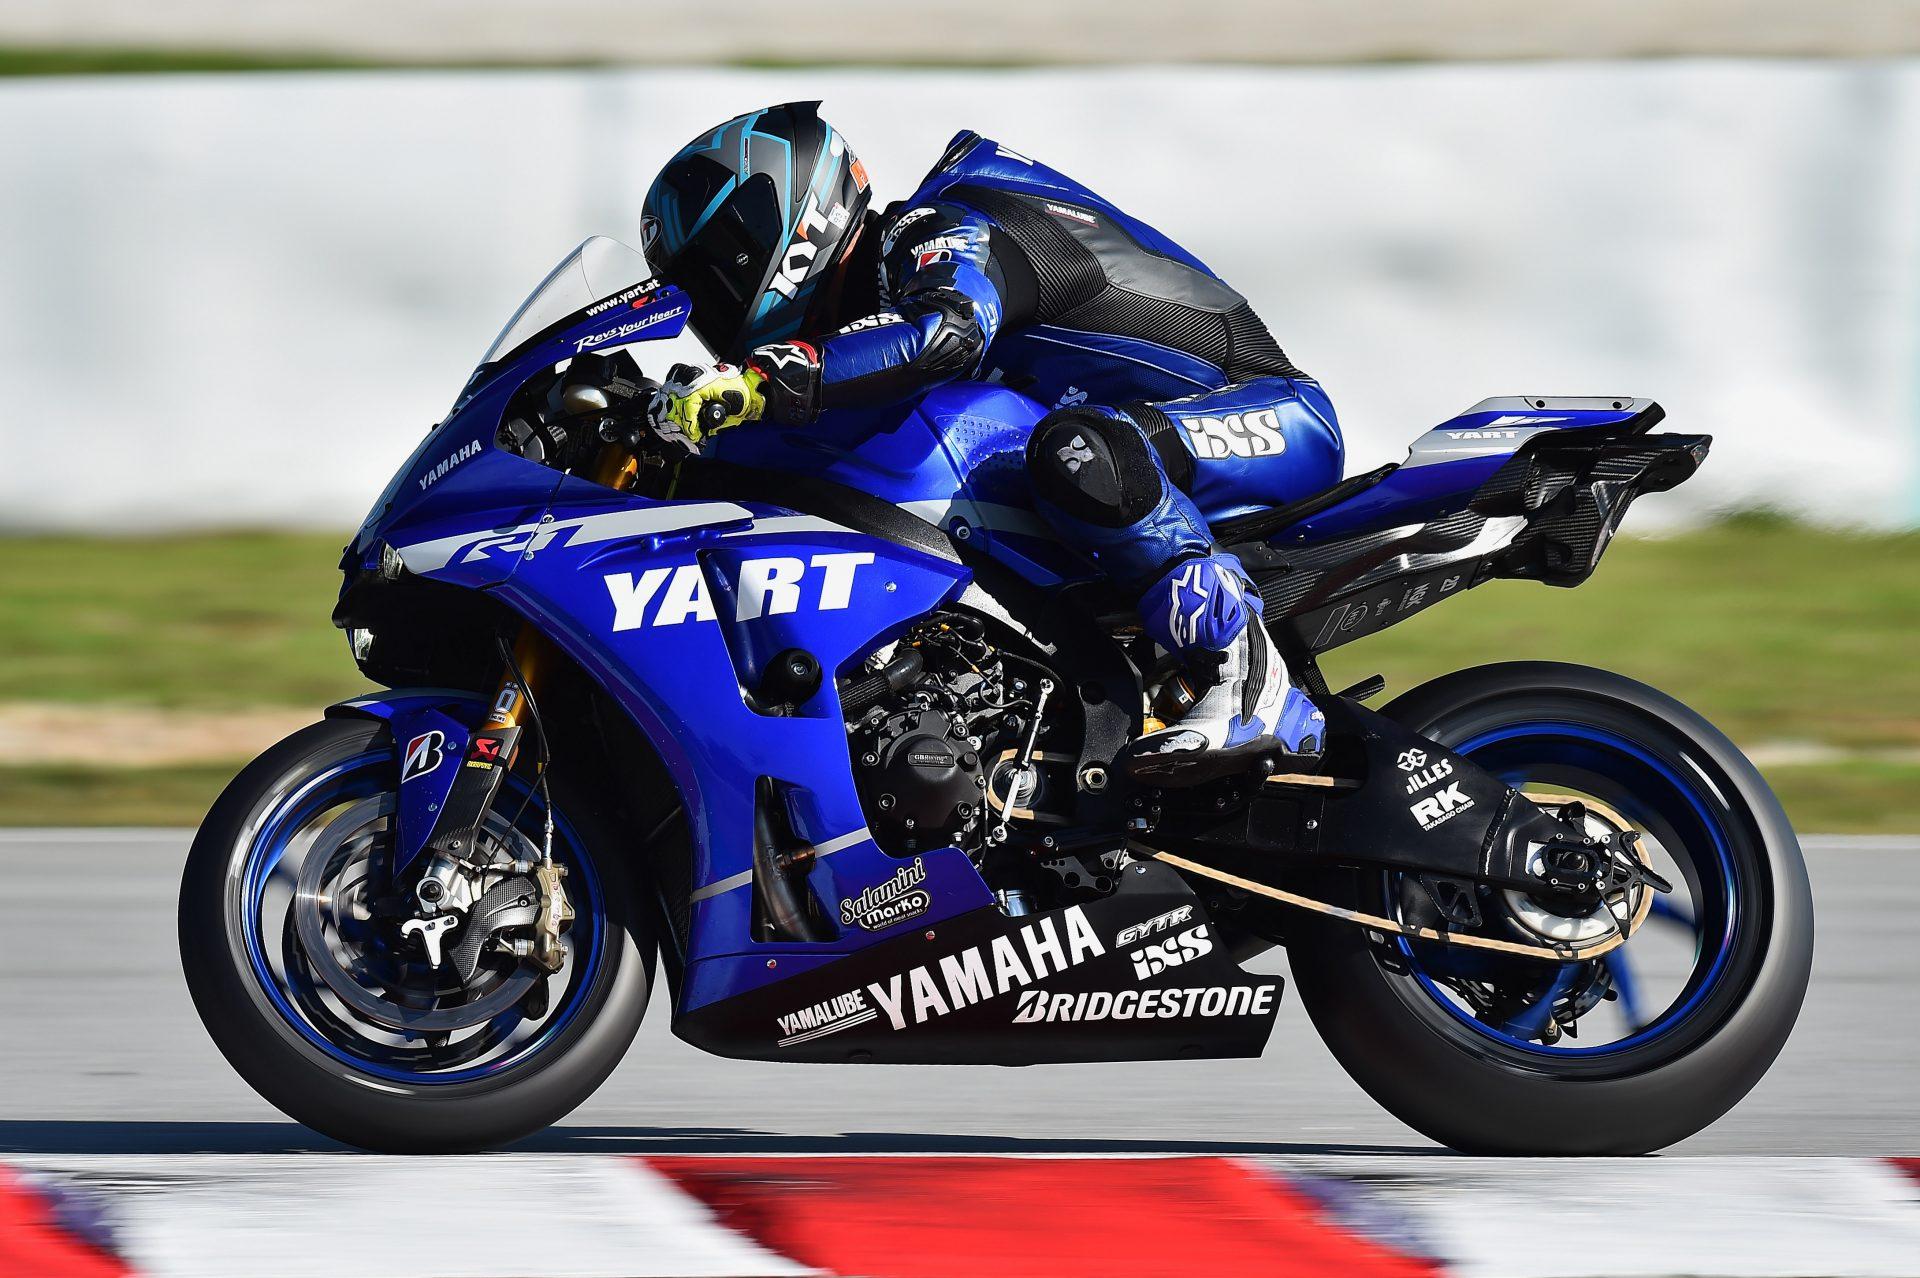 YART YAMAHA AUT Yamaha YZF-R1 Formula EWC PARKES BROC AUS FRITZ MARVIN GER CANEPA NICCOLO ITA 8h Sepang 2019 (Circuit Sepang) 11-14.12.2019 photo: Lukasz Swiderek www.photoPSP.com @photopsp_lukasz_swiderek